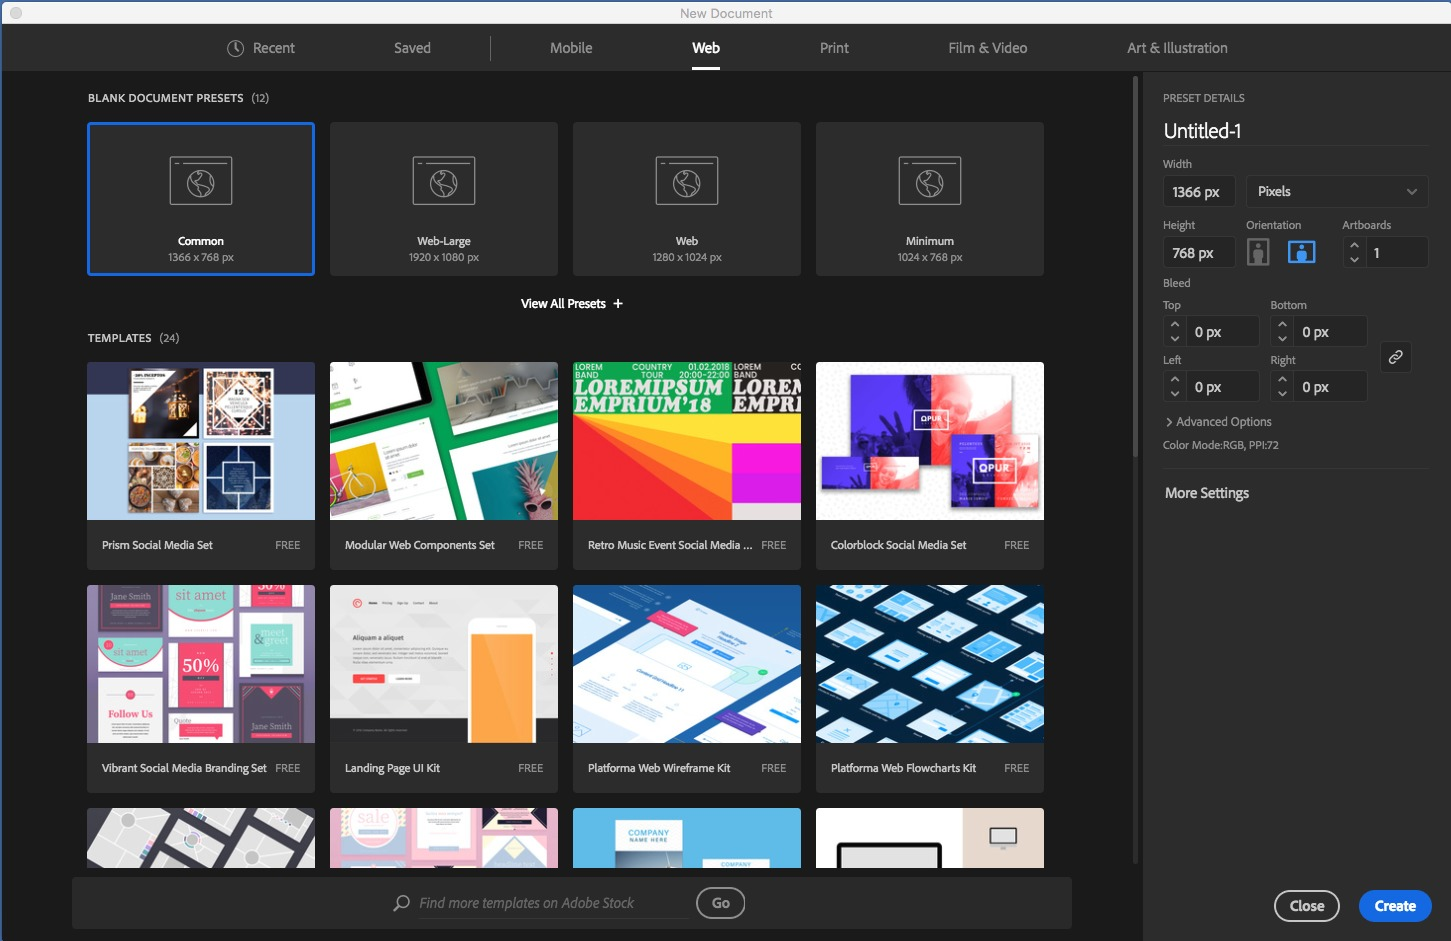 Adobe Illustrator CC 2015 19.2.1